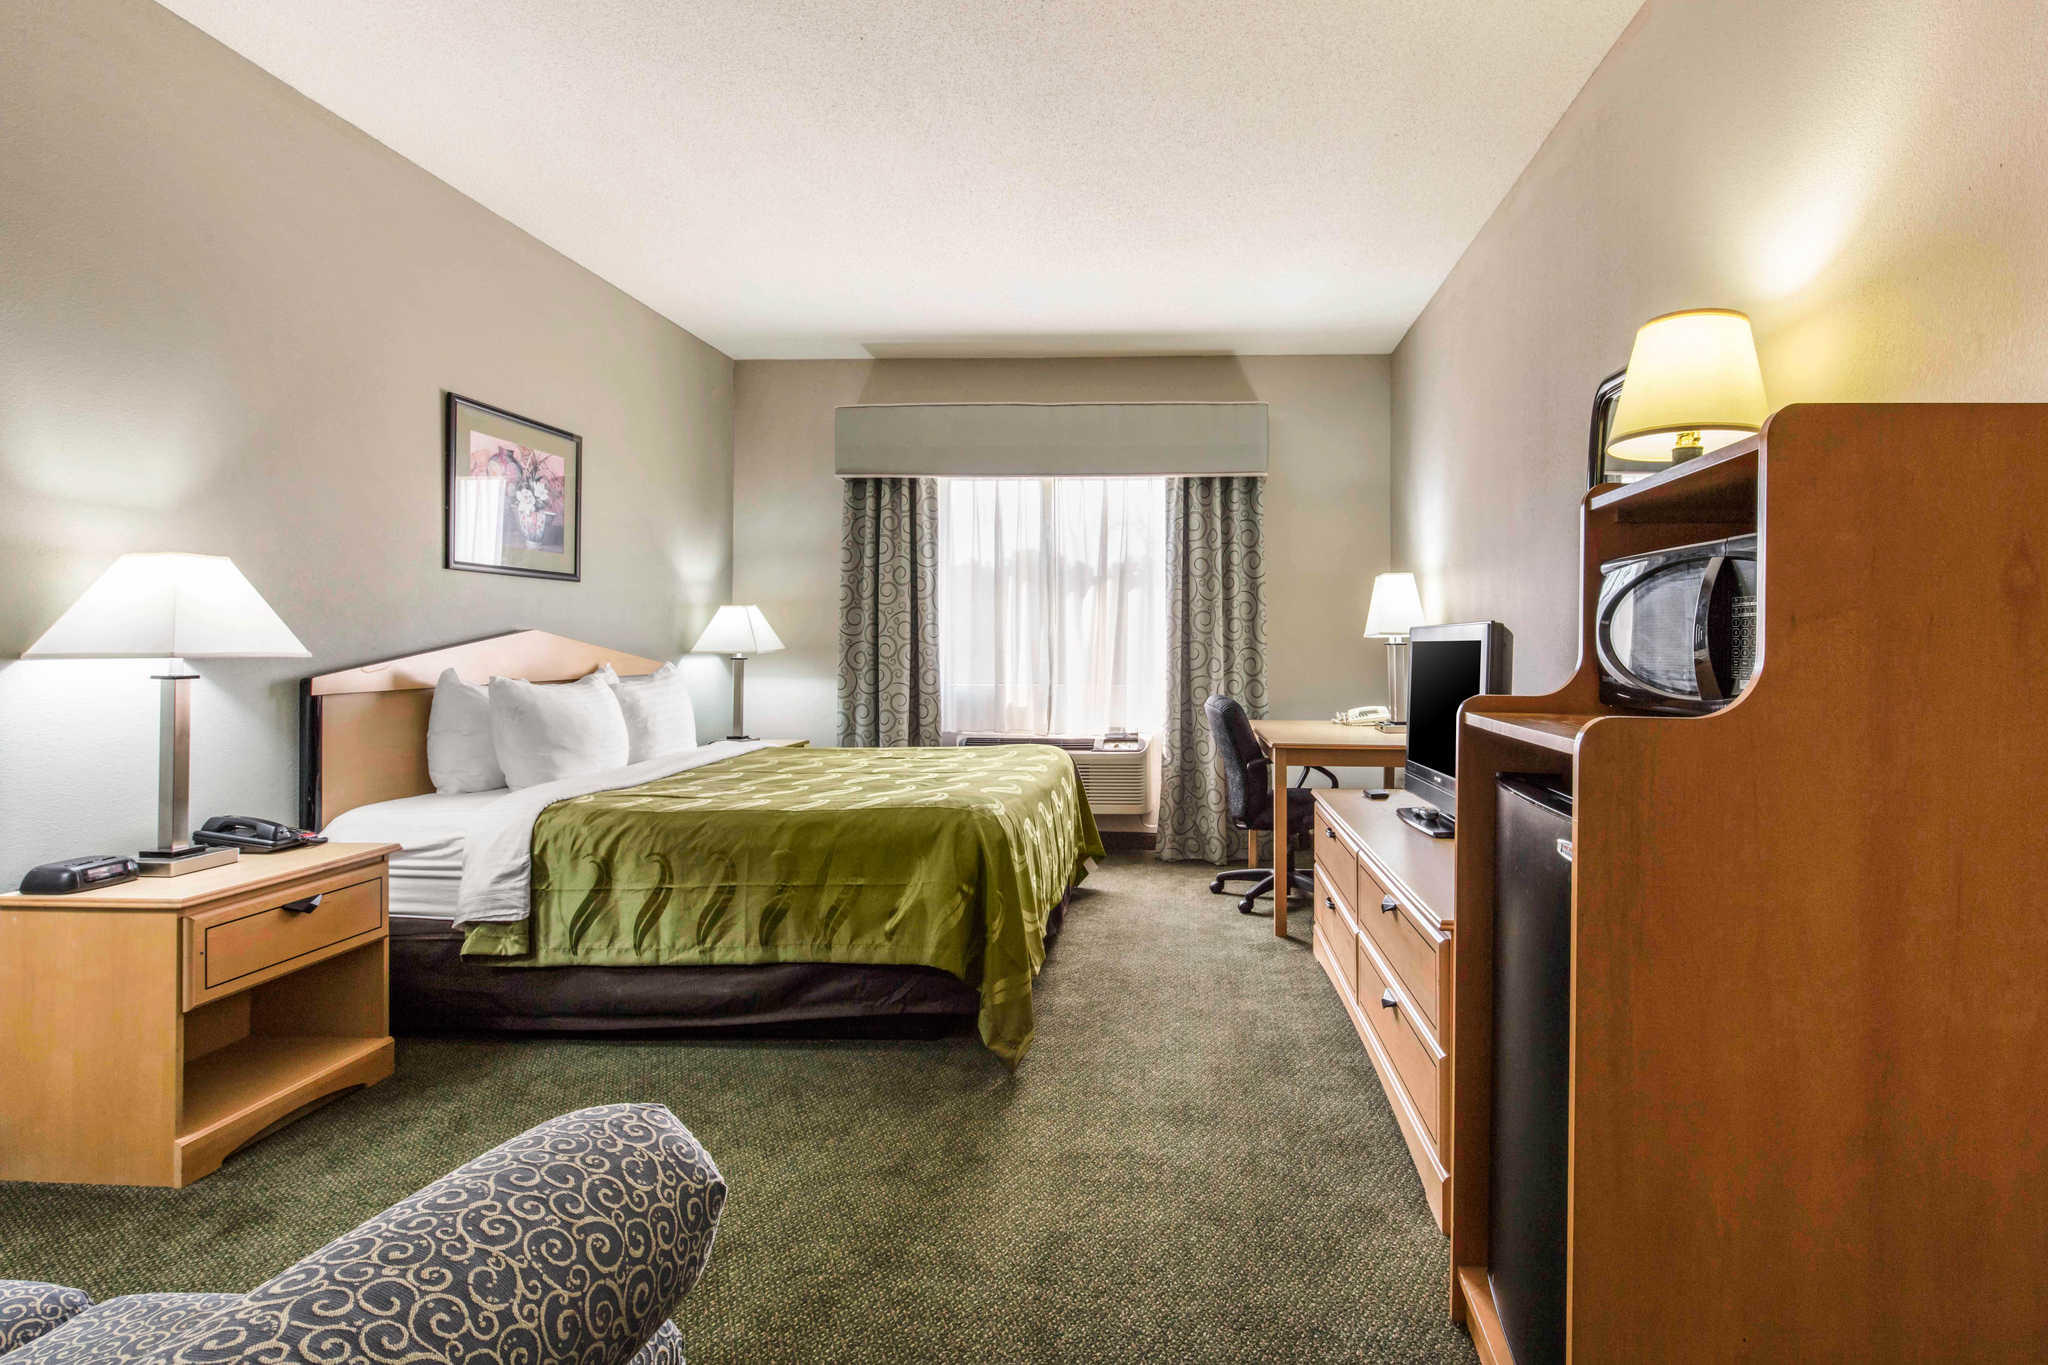 Quality Inn & Suites Jackson Int'l Airport image 21